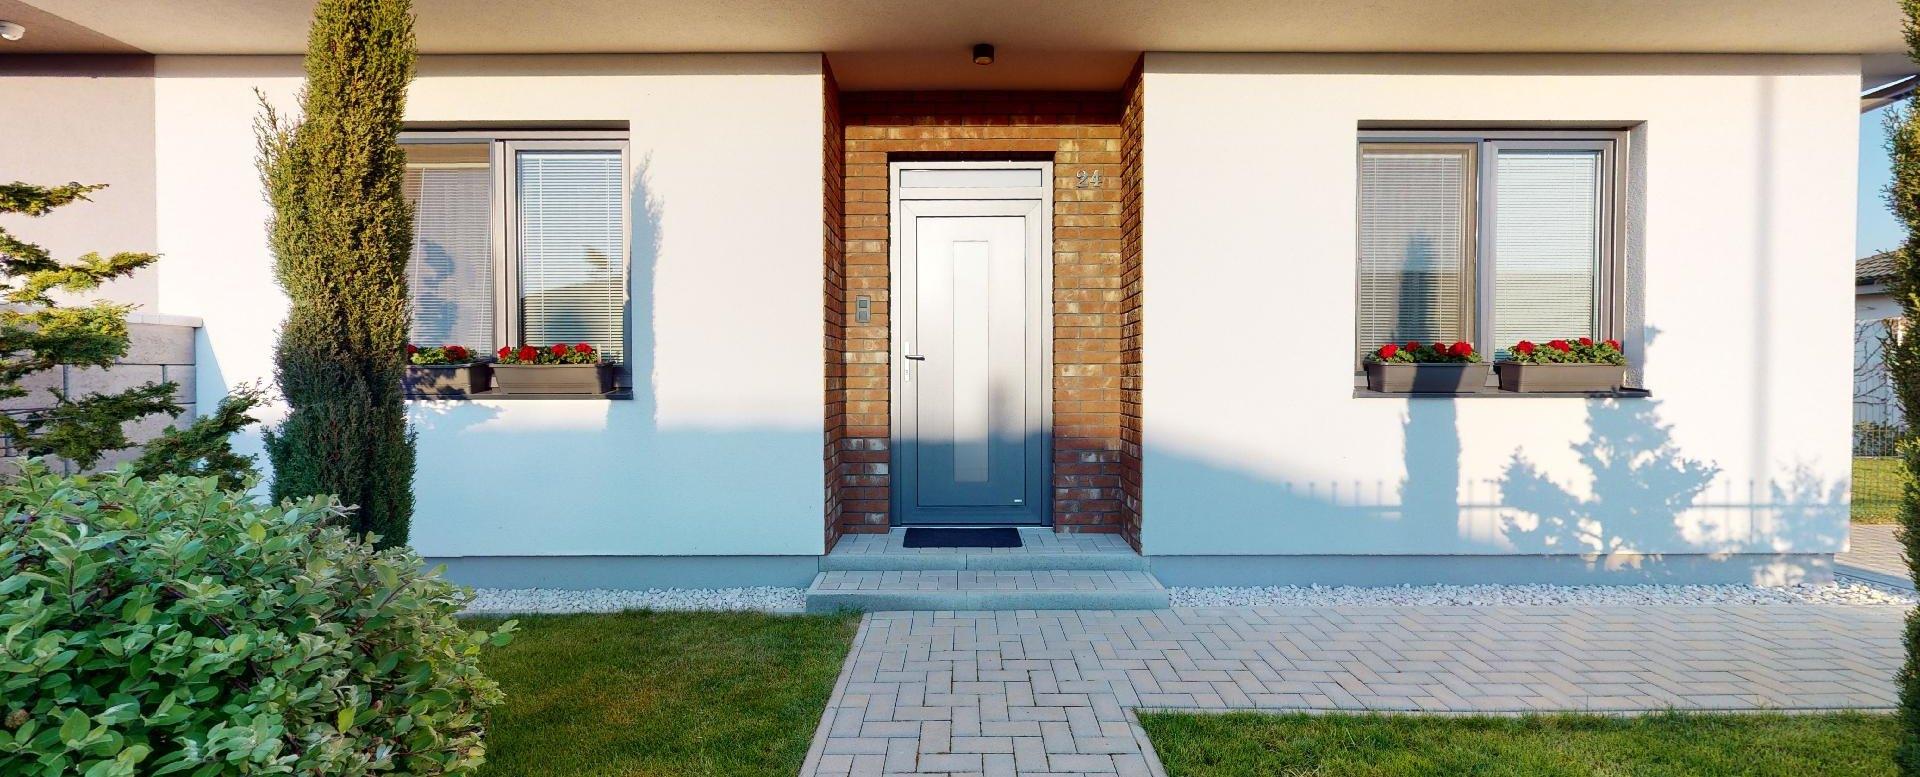 Pohľad na vstup do rodinného domu